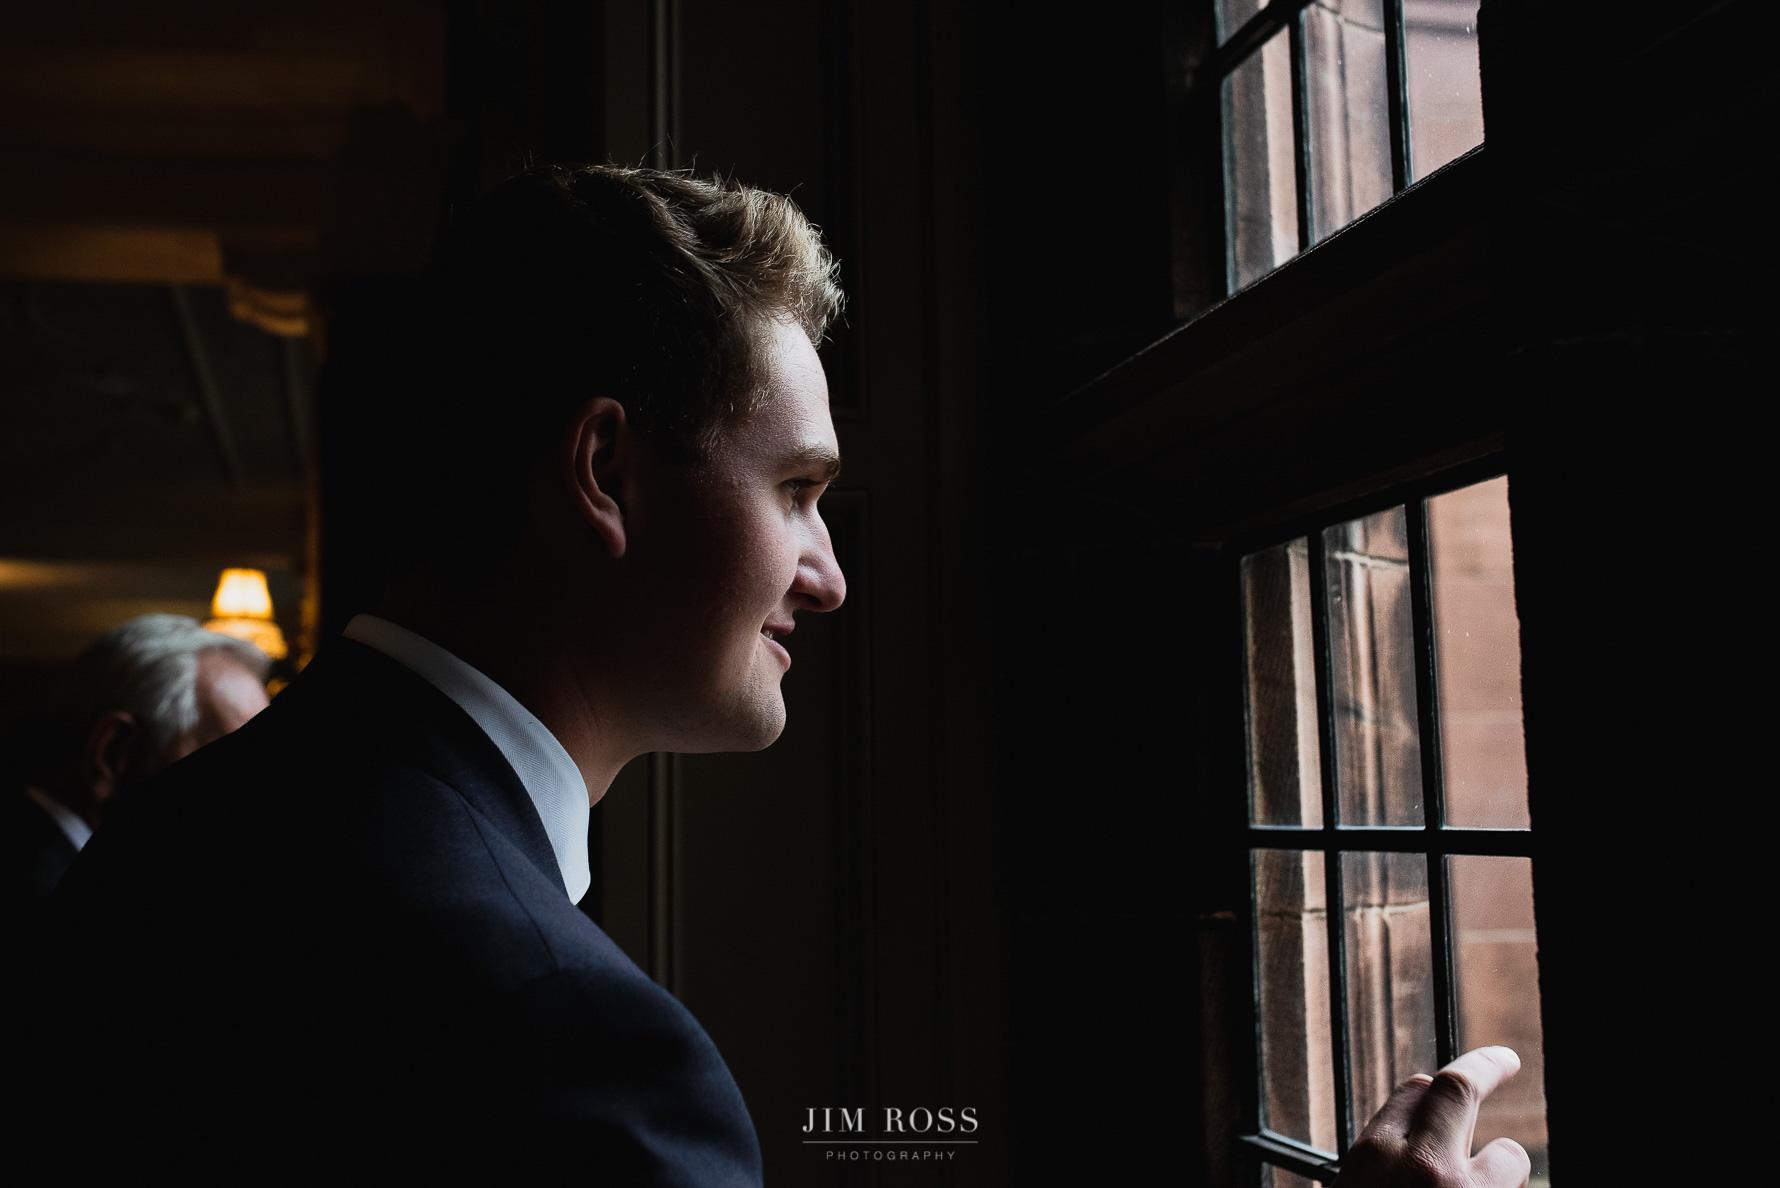 Peering through historic window